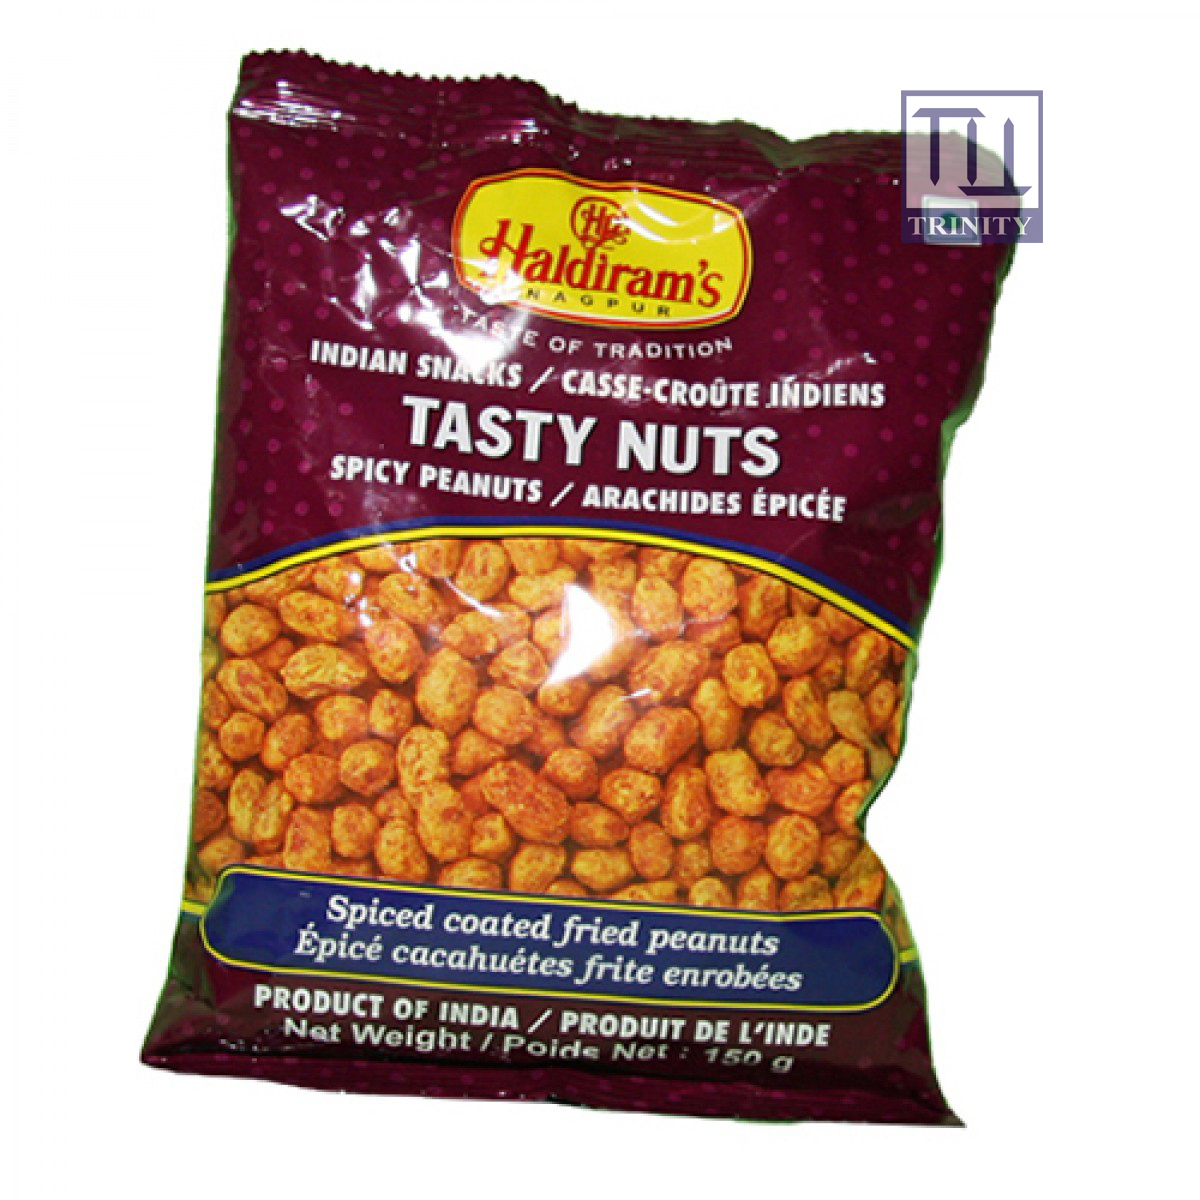 Tasty Nuts 印度 Tasty Nuts 休閒點心